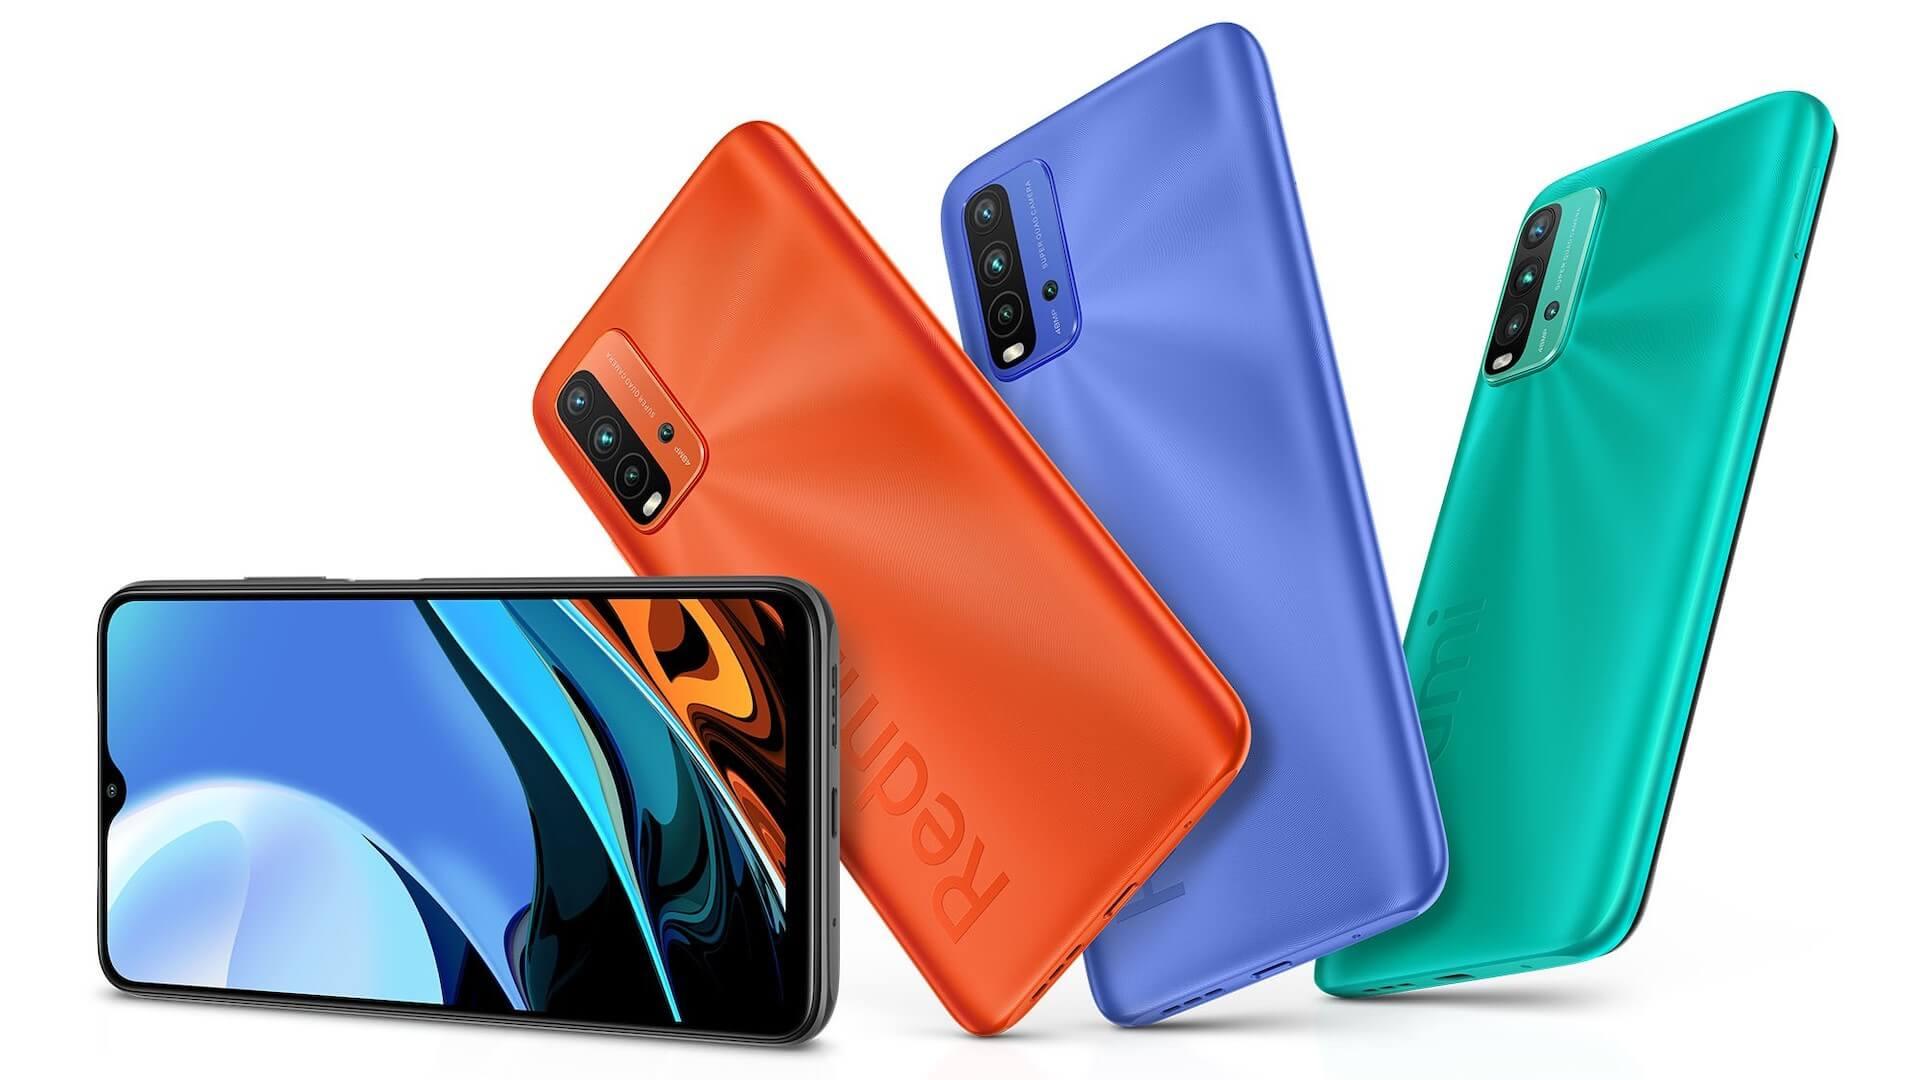 Xiaomi представила смартфоны Redmi Note 9T и Redmi 9T с батареей на 6000 мАч